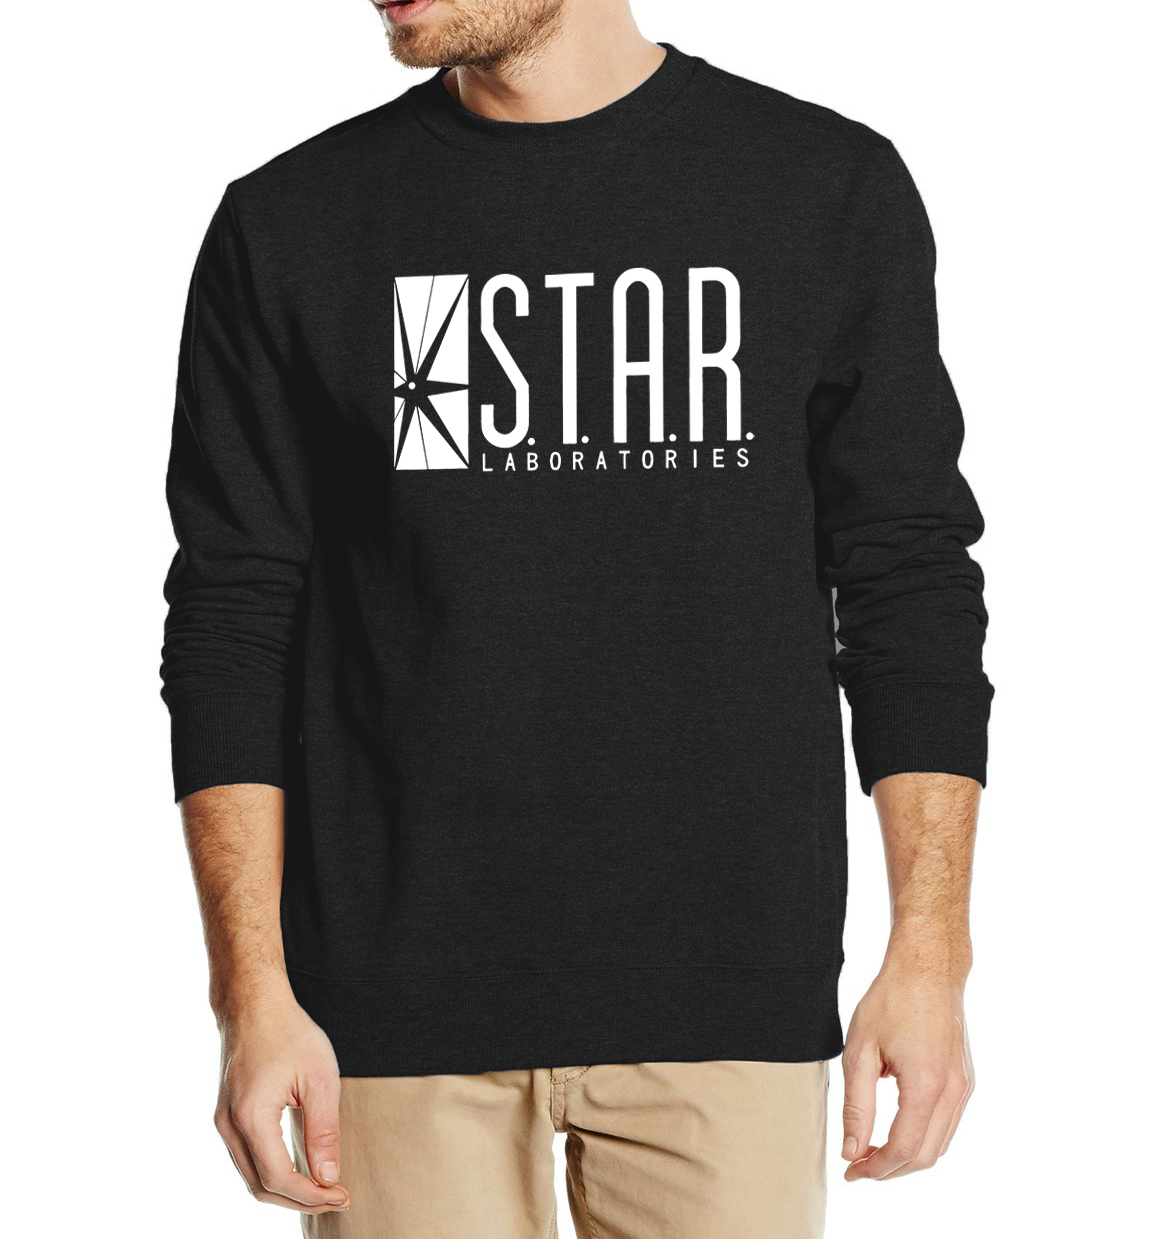 Superman Series Men Sweatshirt STAR S.T.A.R.labs autumn winter 2017 new fashion hoodies cool streetwear tracksuit high quality